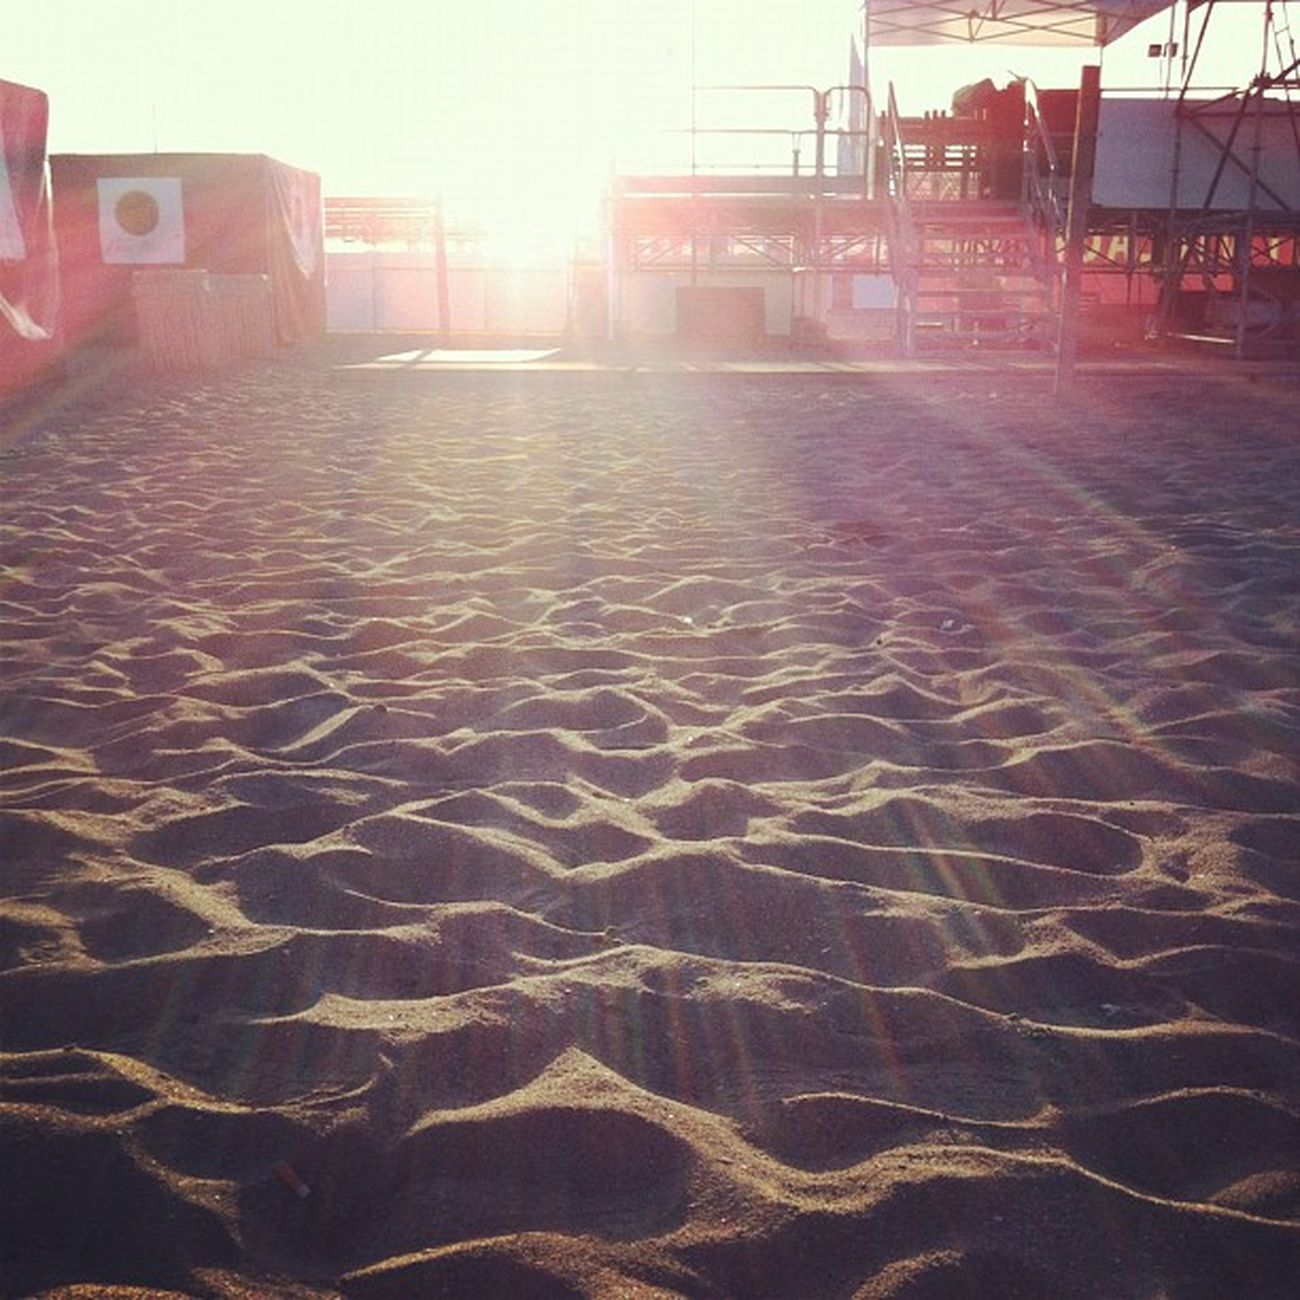 Hakuna Matata beach.! Super enjoi dis dae! (': kht nd as in habeiiii!! ????? @luvligurrl @mhiiszabii @arjoromerohernandez @abie_bon @aneroniel @just_layka @phunkpyincess @ajhay_14 @luvligurrl ?Kabataan ?Hakunamatatabeach ?Proudtobepilipino ?Summer2012 ?instamood ?iphone ?omg ?photooftheday ?pinay ?makuletnabata ?batabatuta ?adiik ?tambayeur ?kaadikan ?momaii ?myempire